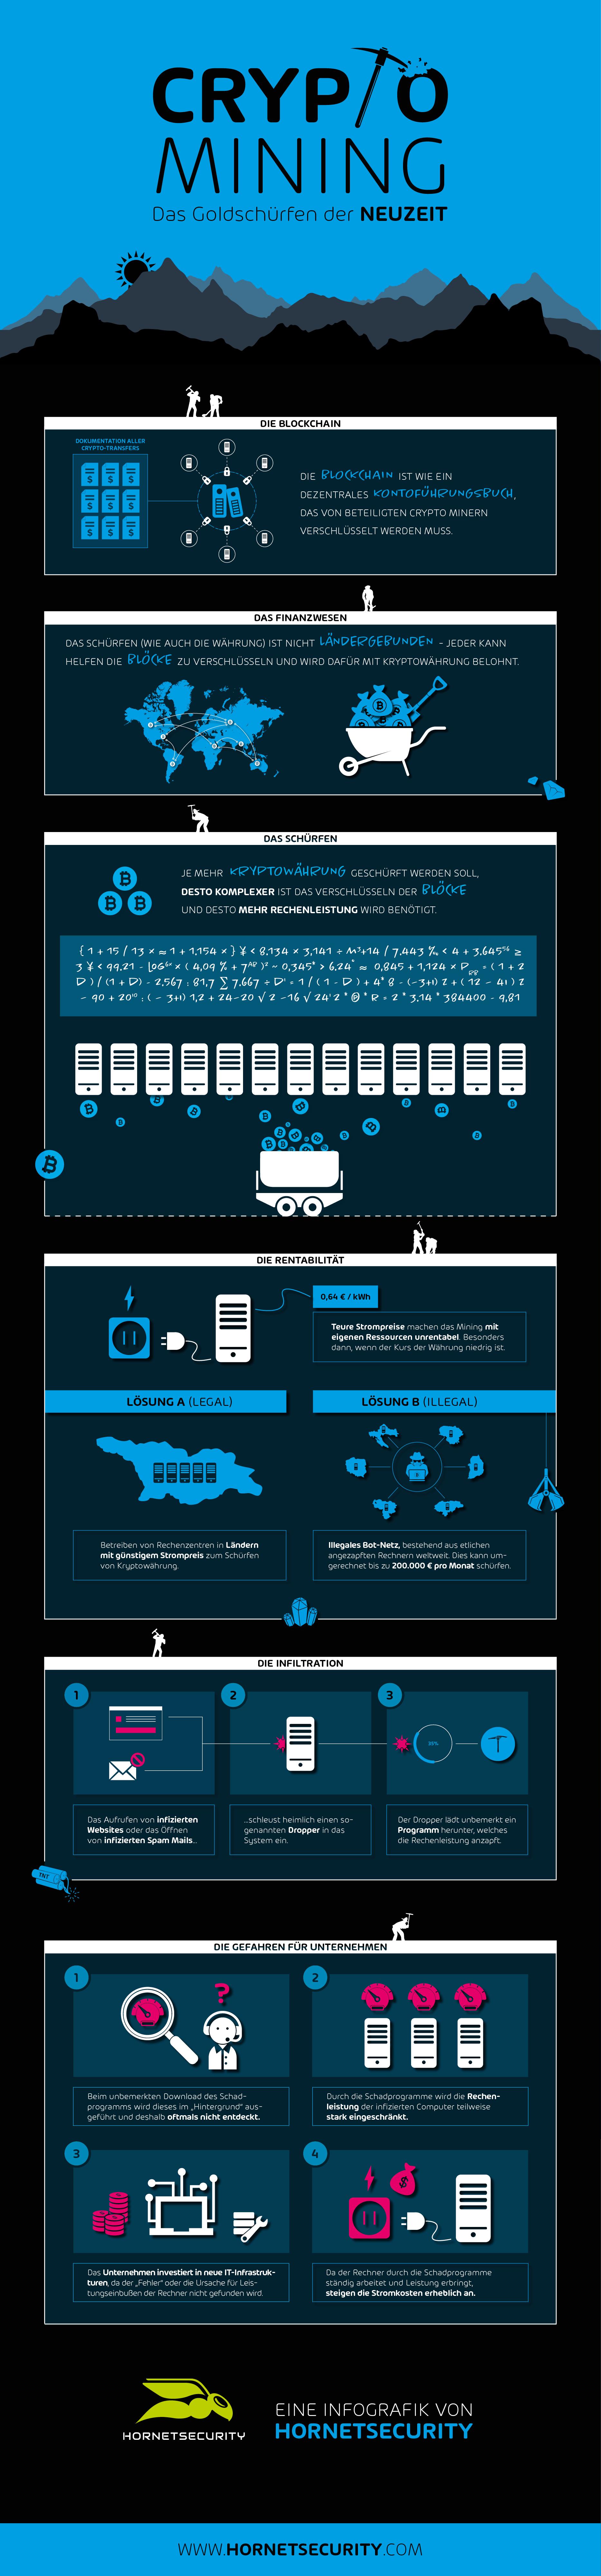 Crypto Mining Infografik von Hornetsecurity